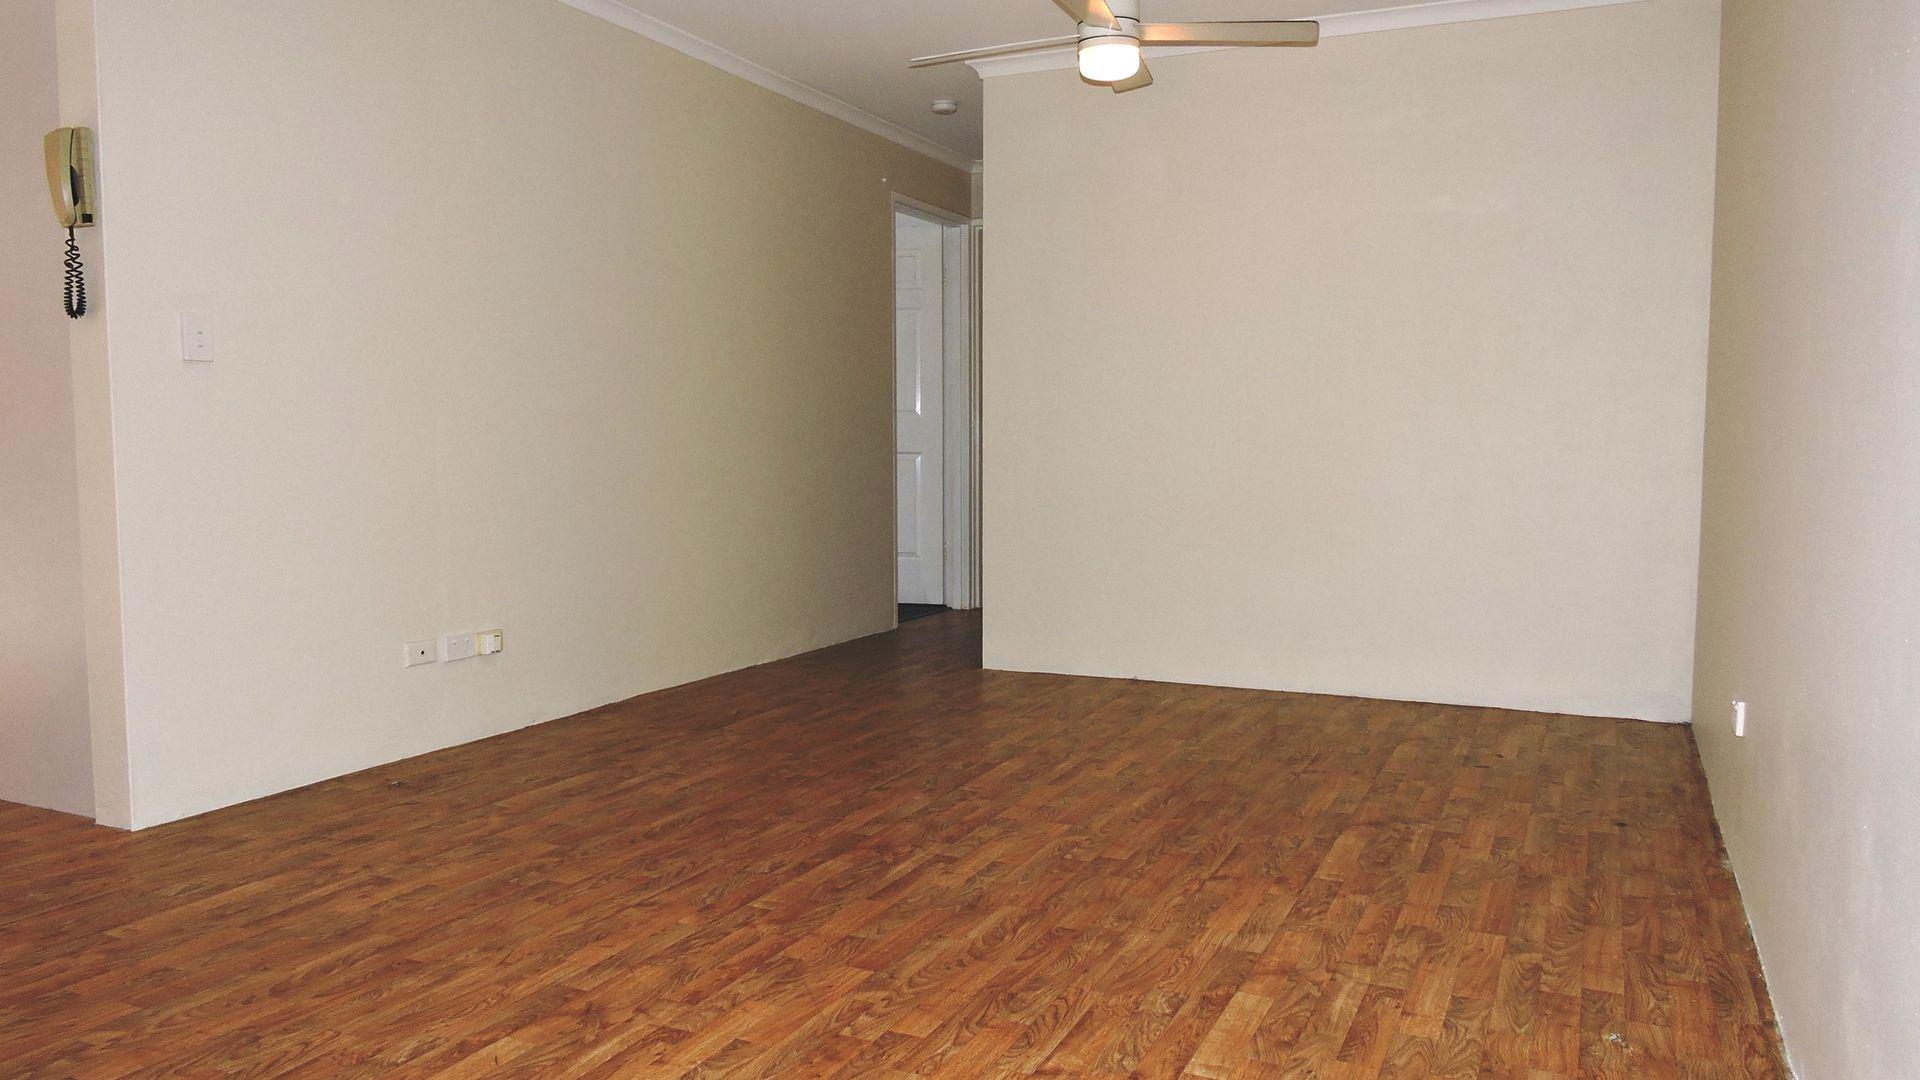 17/23-27 Hills Street, Gosford NSW 2250, Image 2